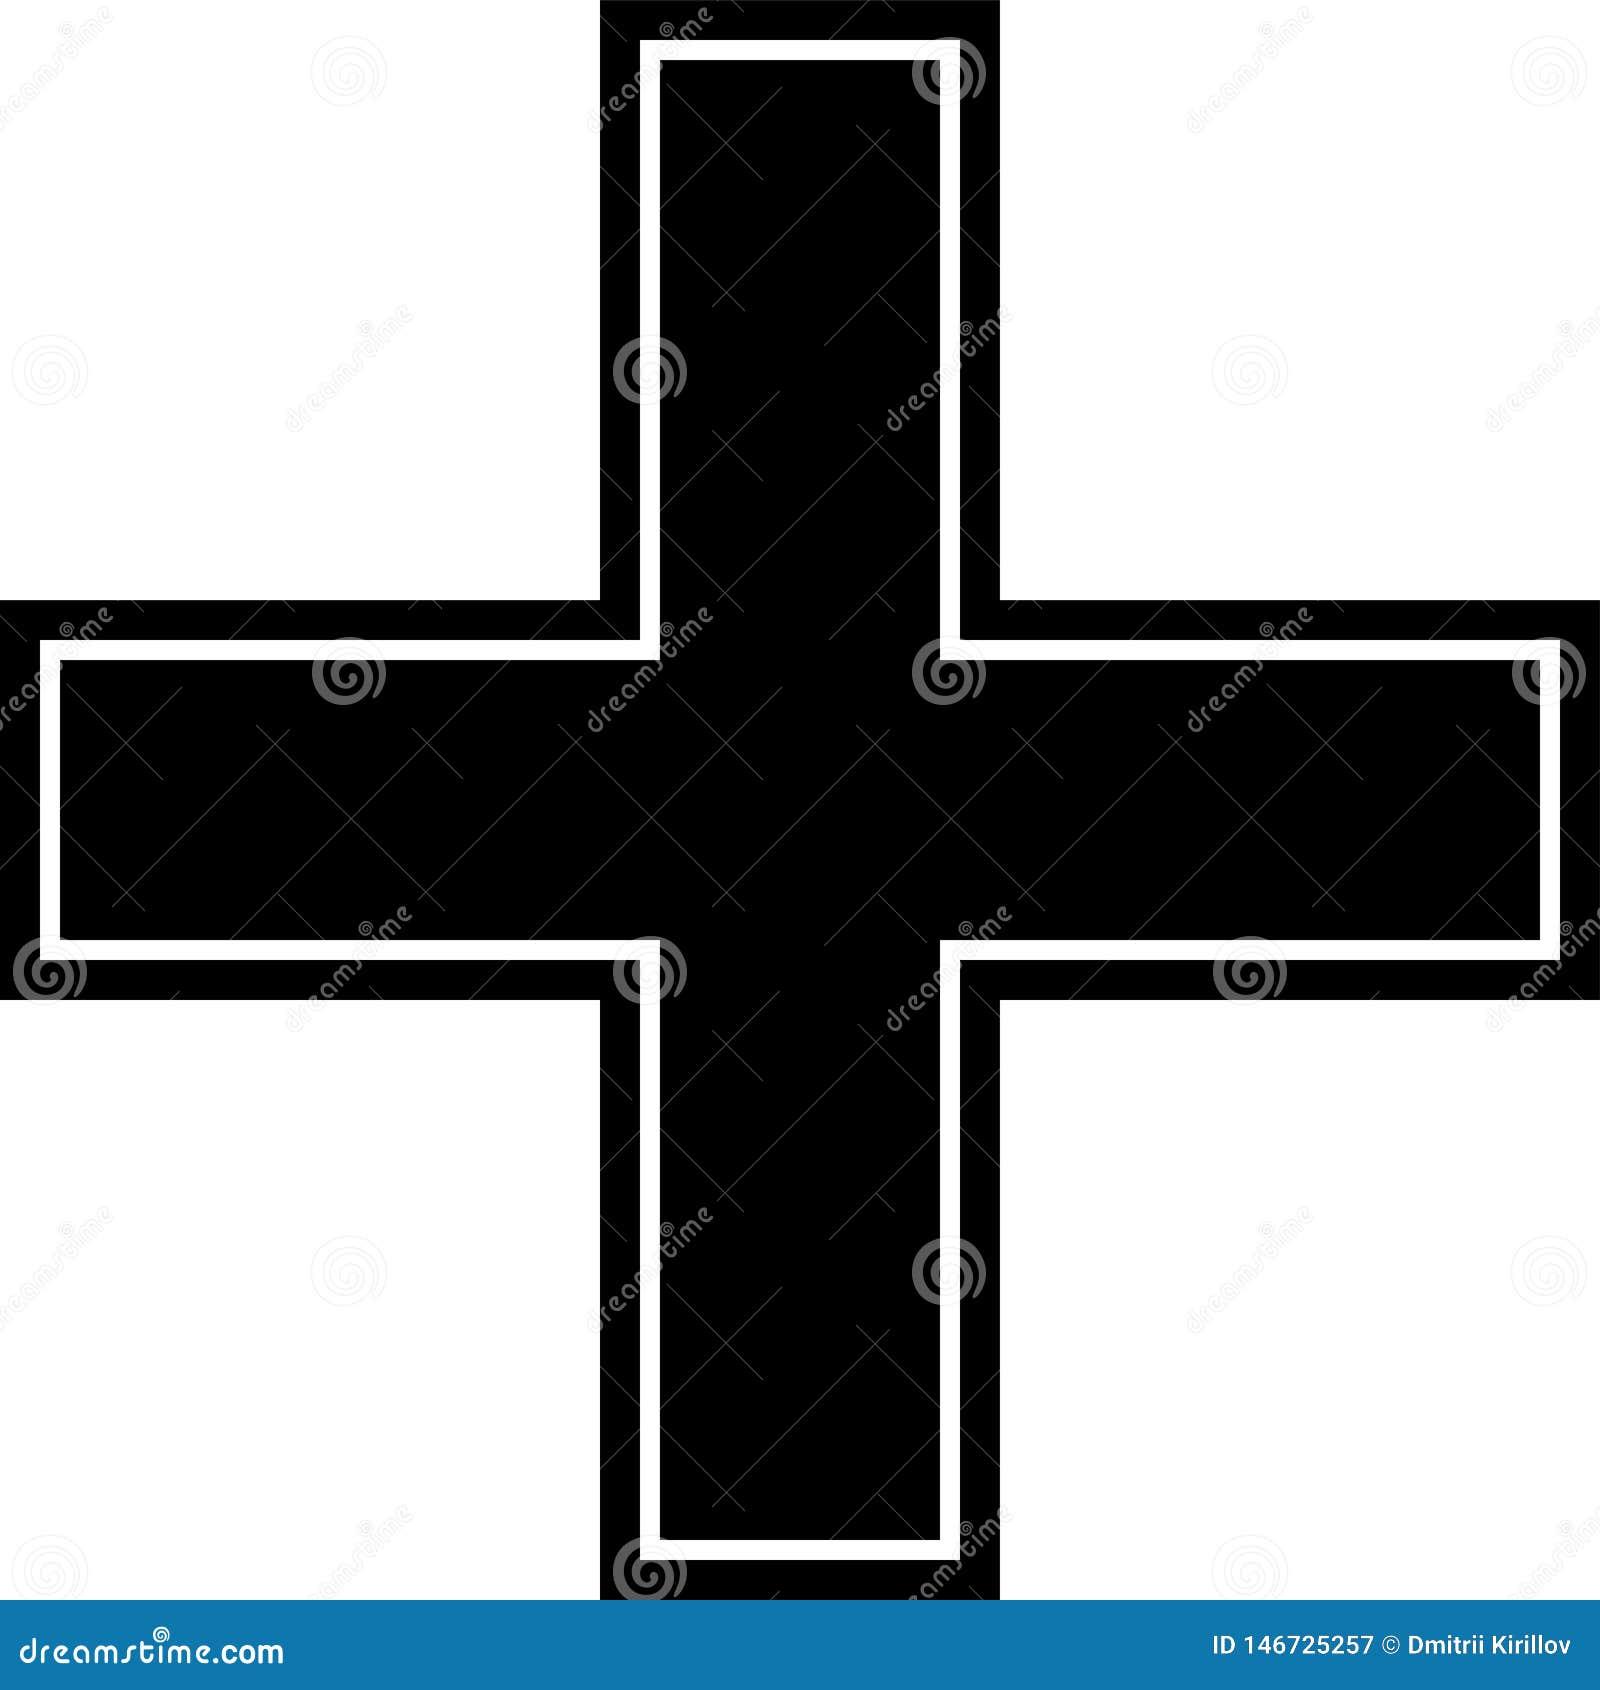 N?d-, argt, r?tt, svart, ram & frameless symbol som isoleras p? vit bakgrund